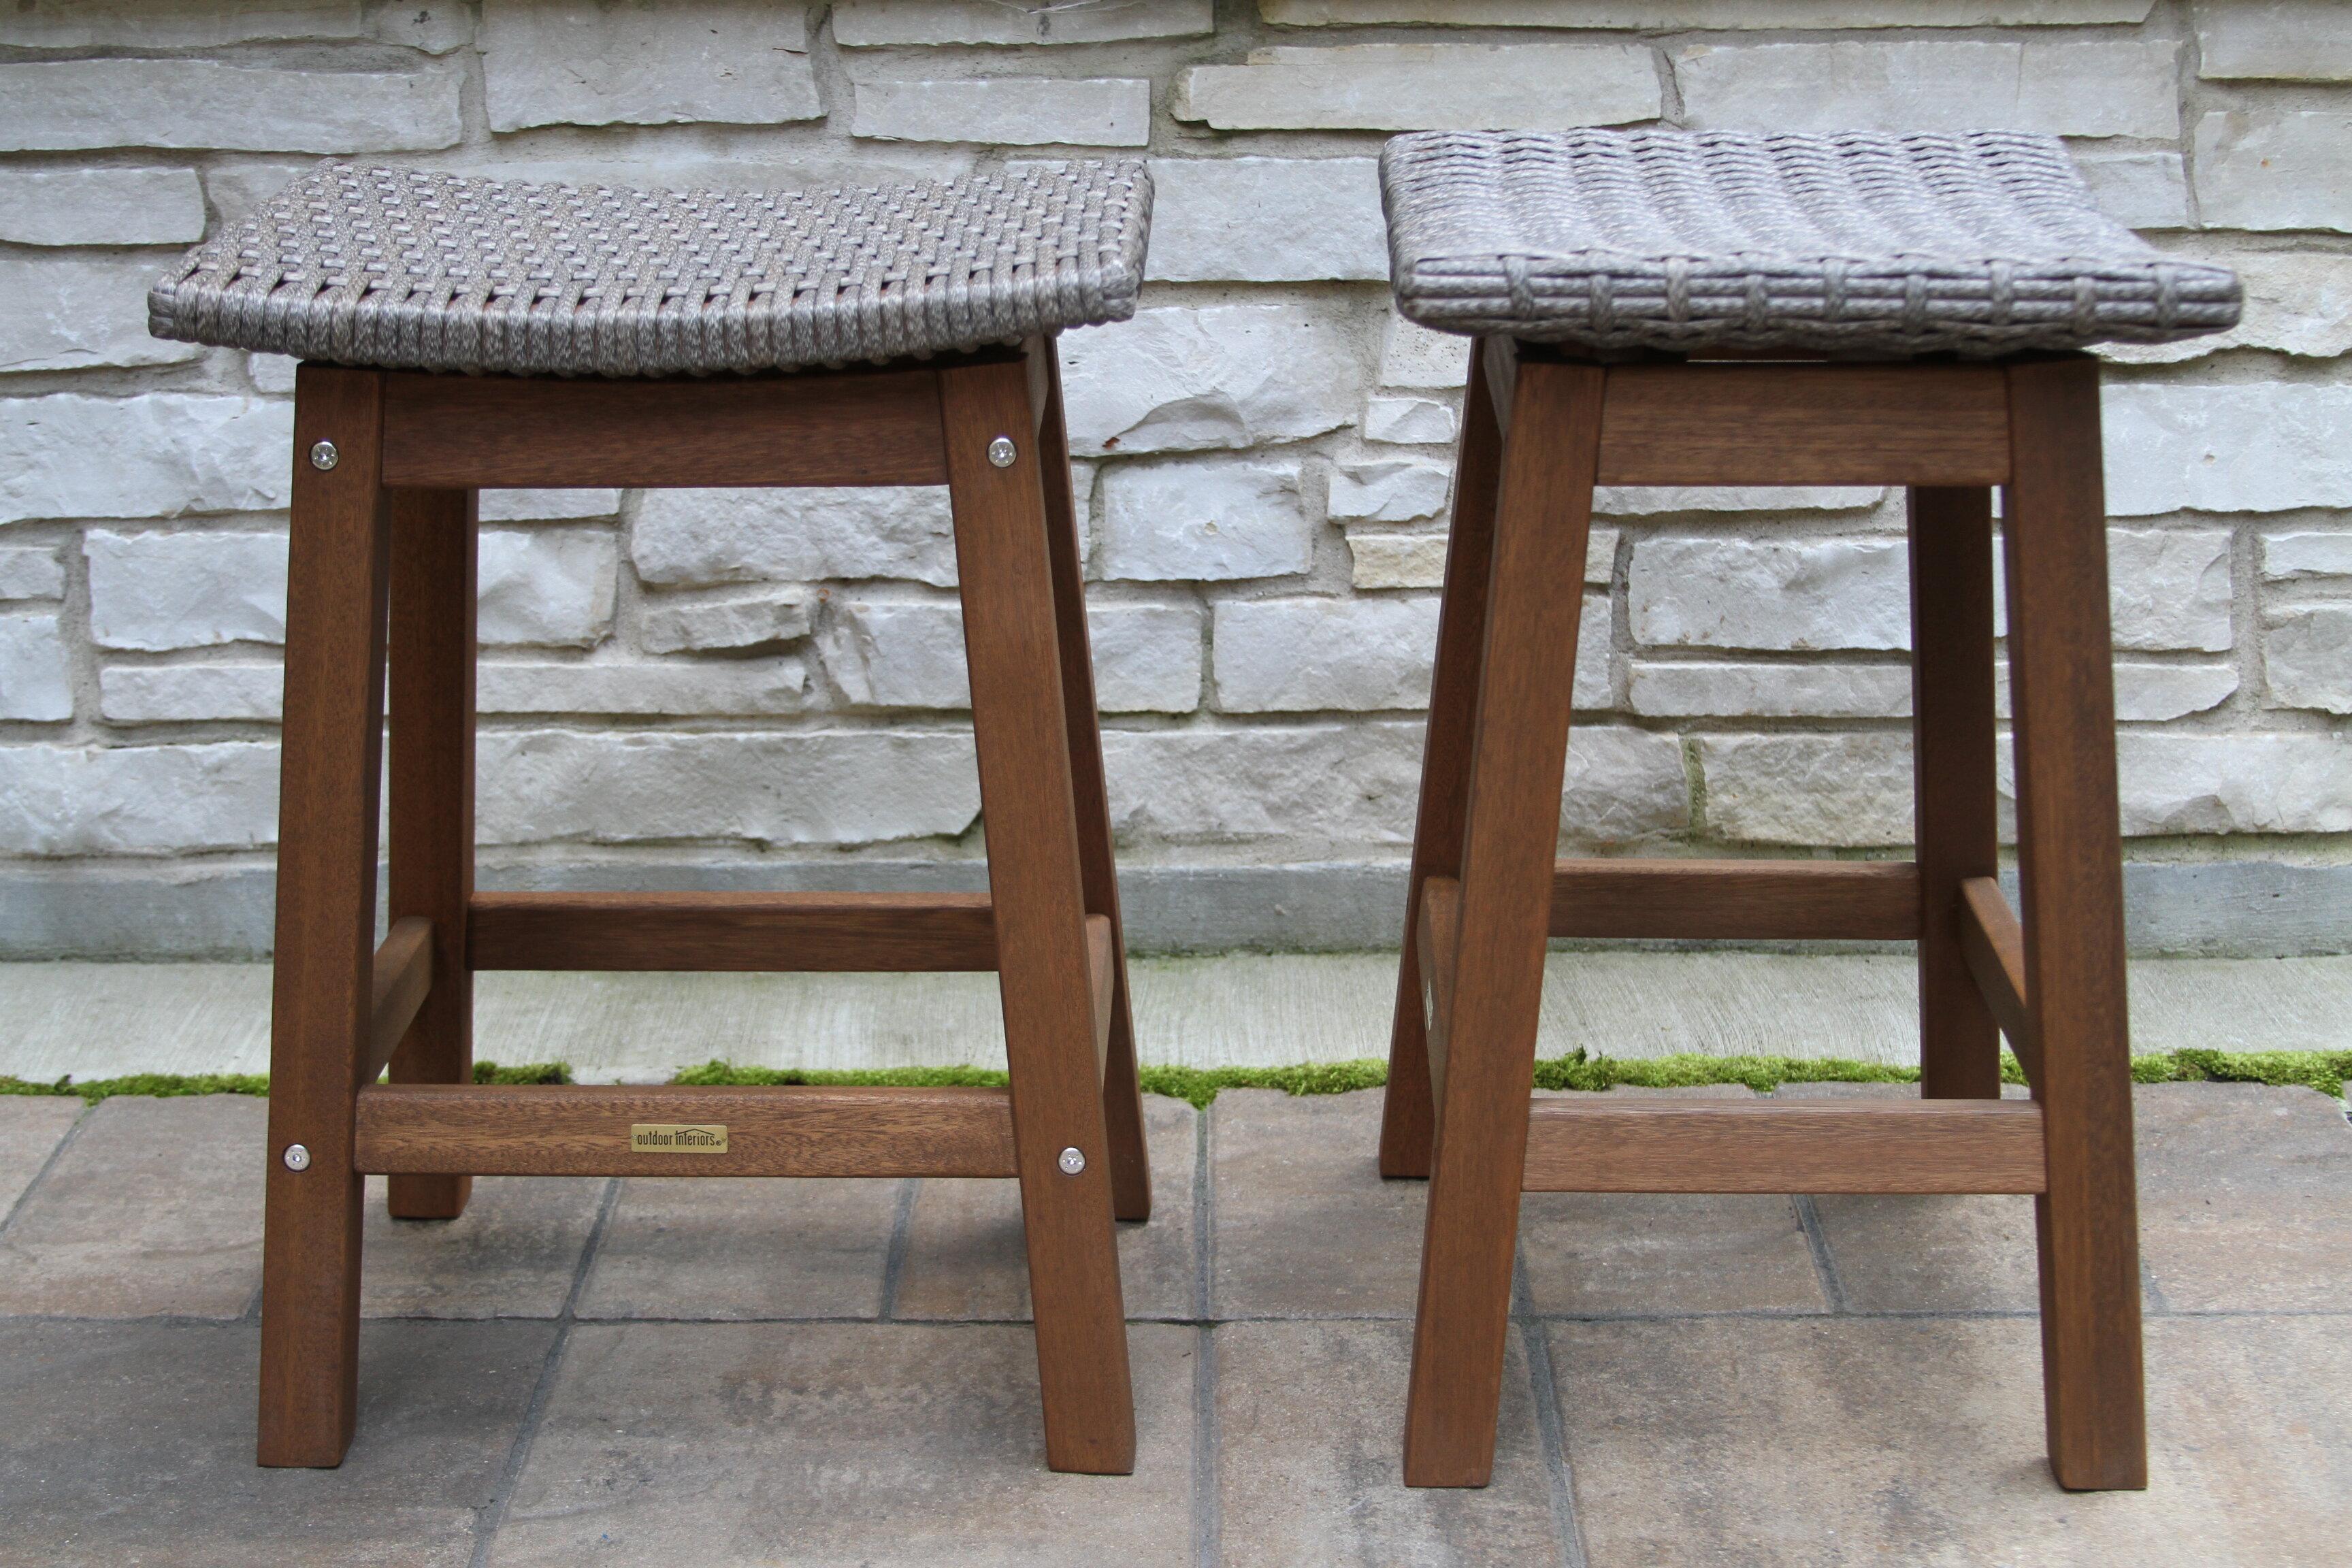 Prime Jeffers Wicker 24 Patio Bar Stool Unemploymentrelief Wooden Chair Designs For Living Room Unemploymentrelieforg